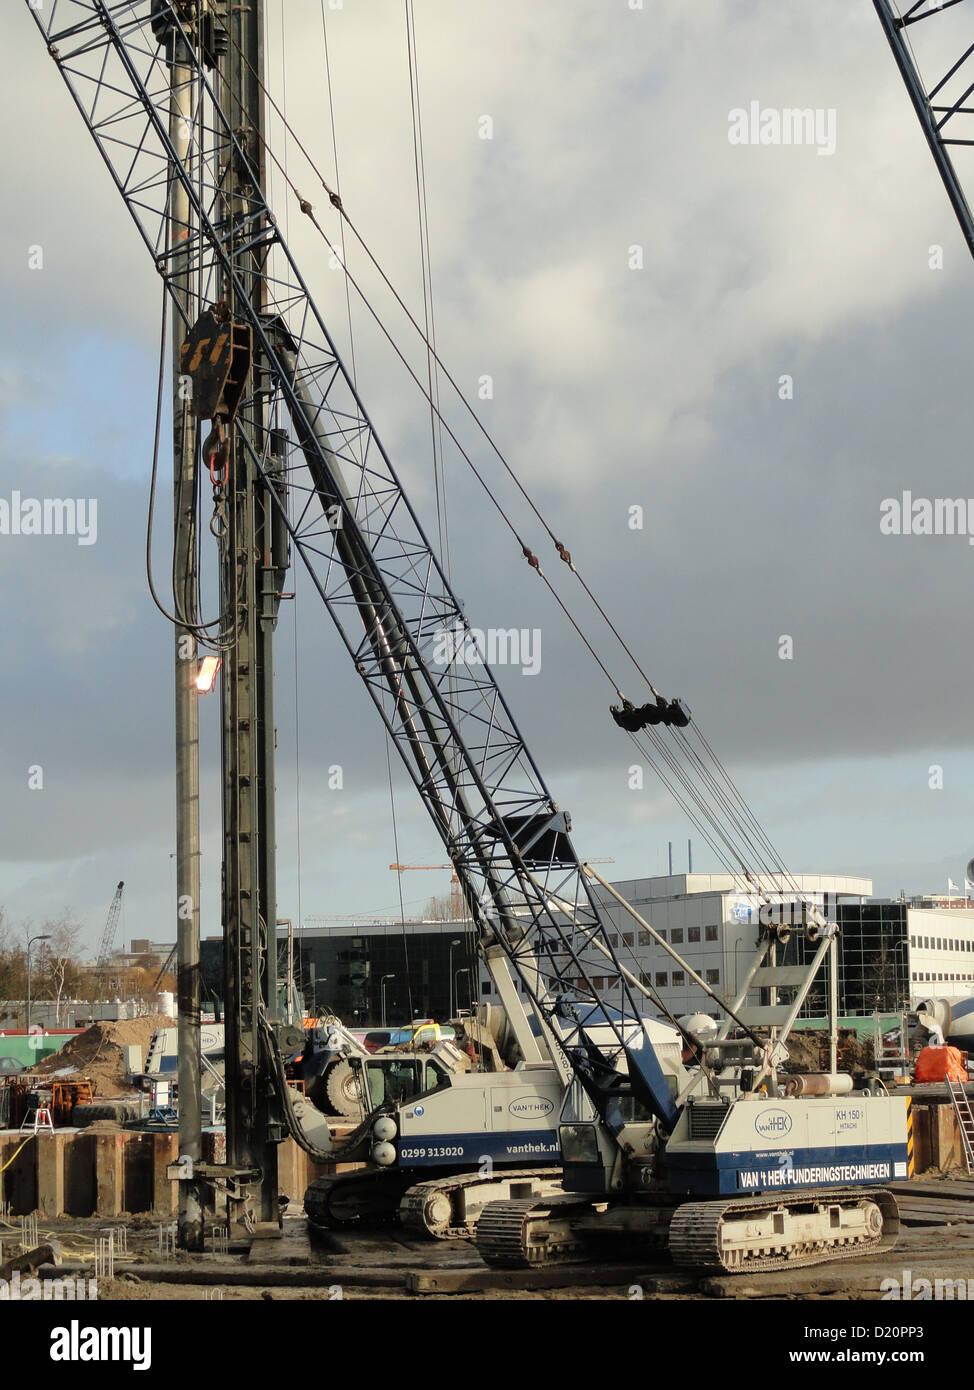 Hitachi Crawler Cranes kh 150 - Stock Image